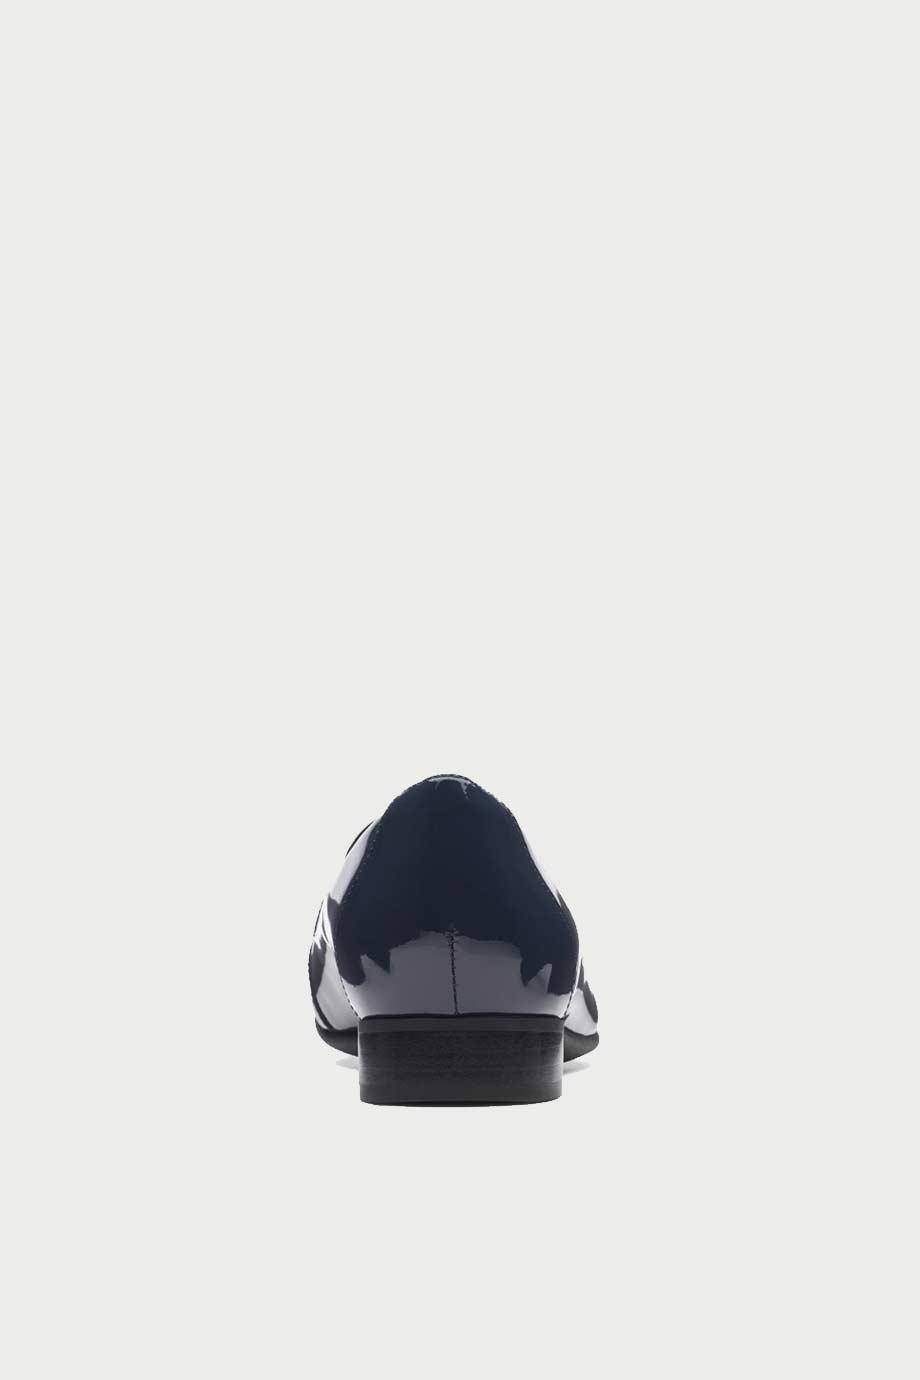 spiridoula metheniti shoes xalkida p un blush go clarks navy patent 6 1